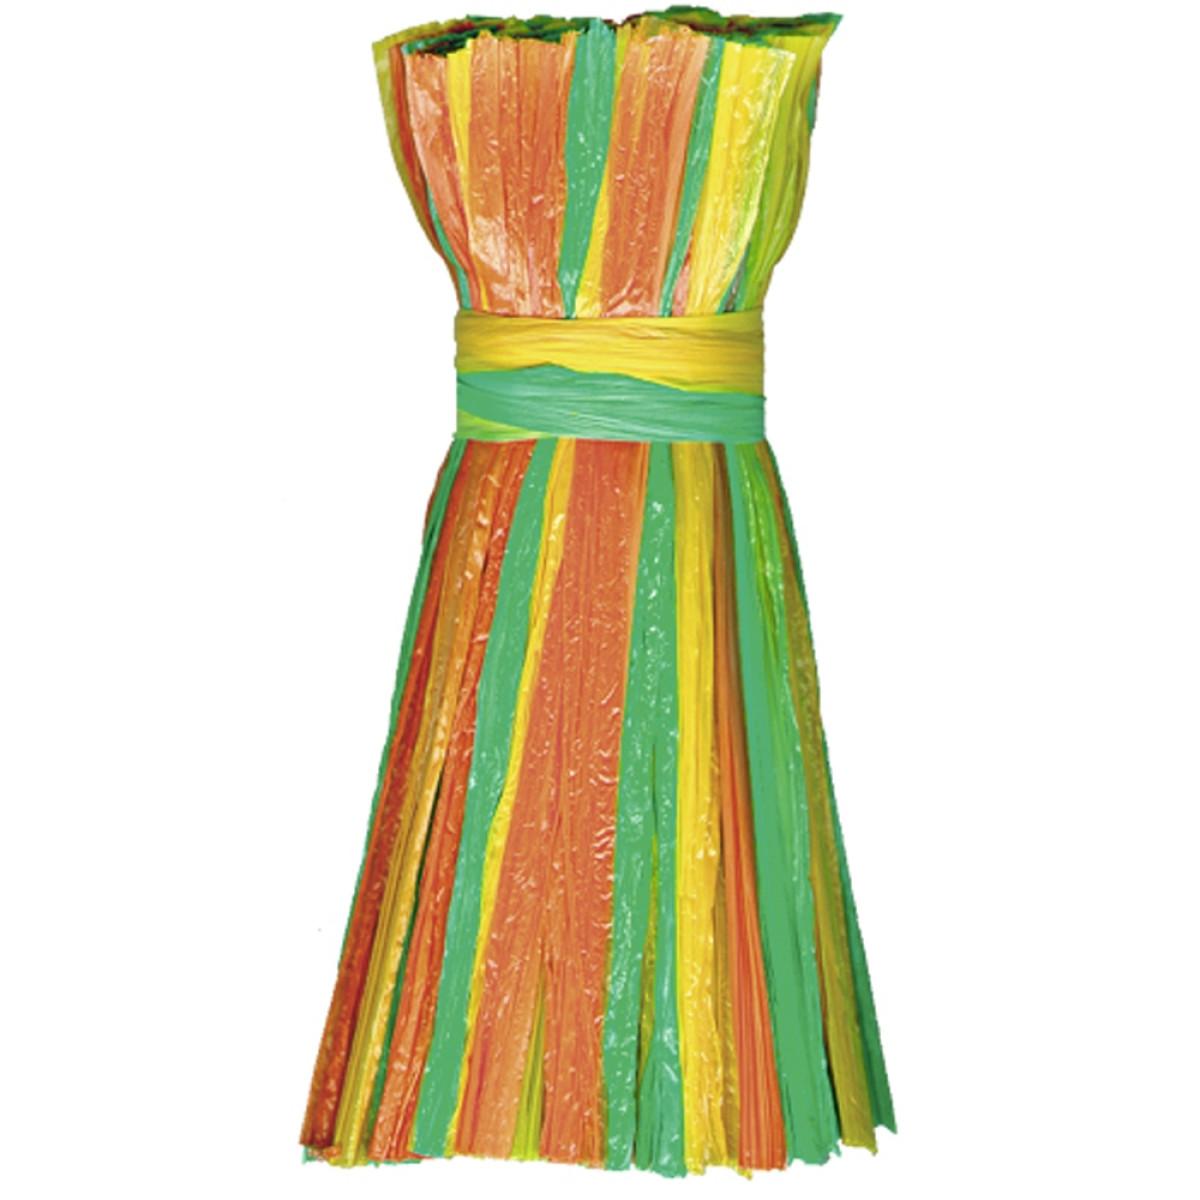 "Edelbast matt ""multicolor"" grün/gelb/orange - 30 Meter"